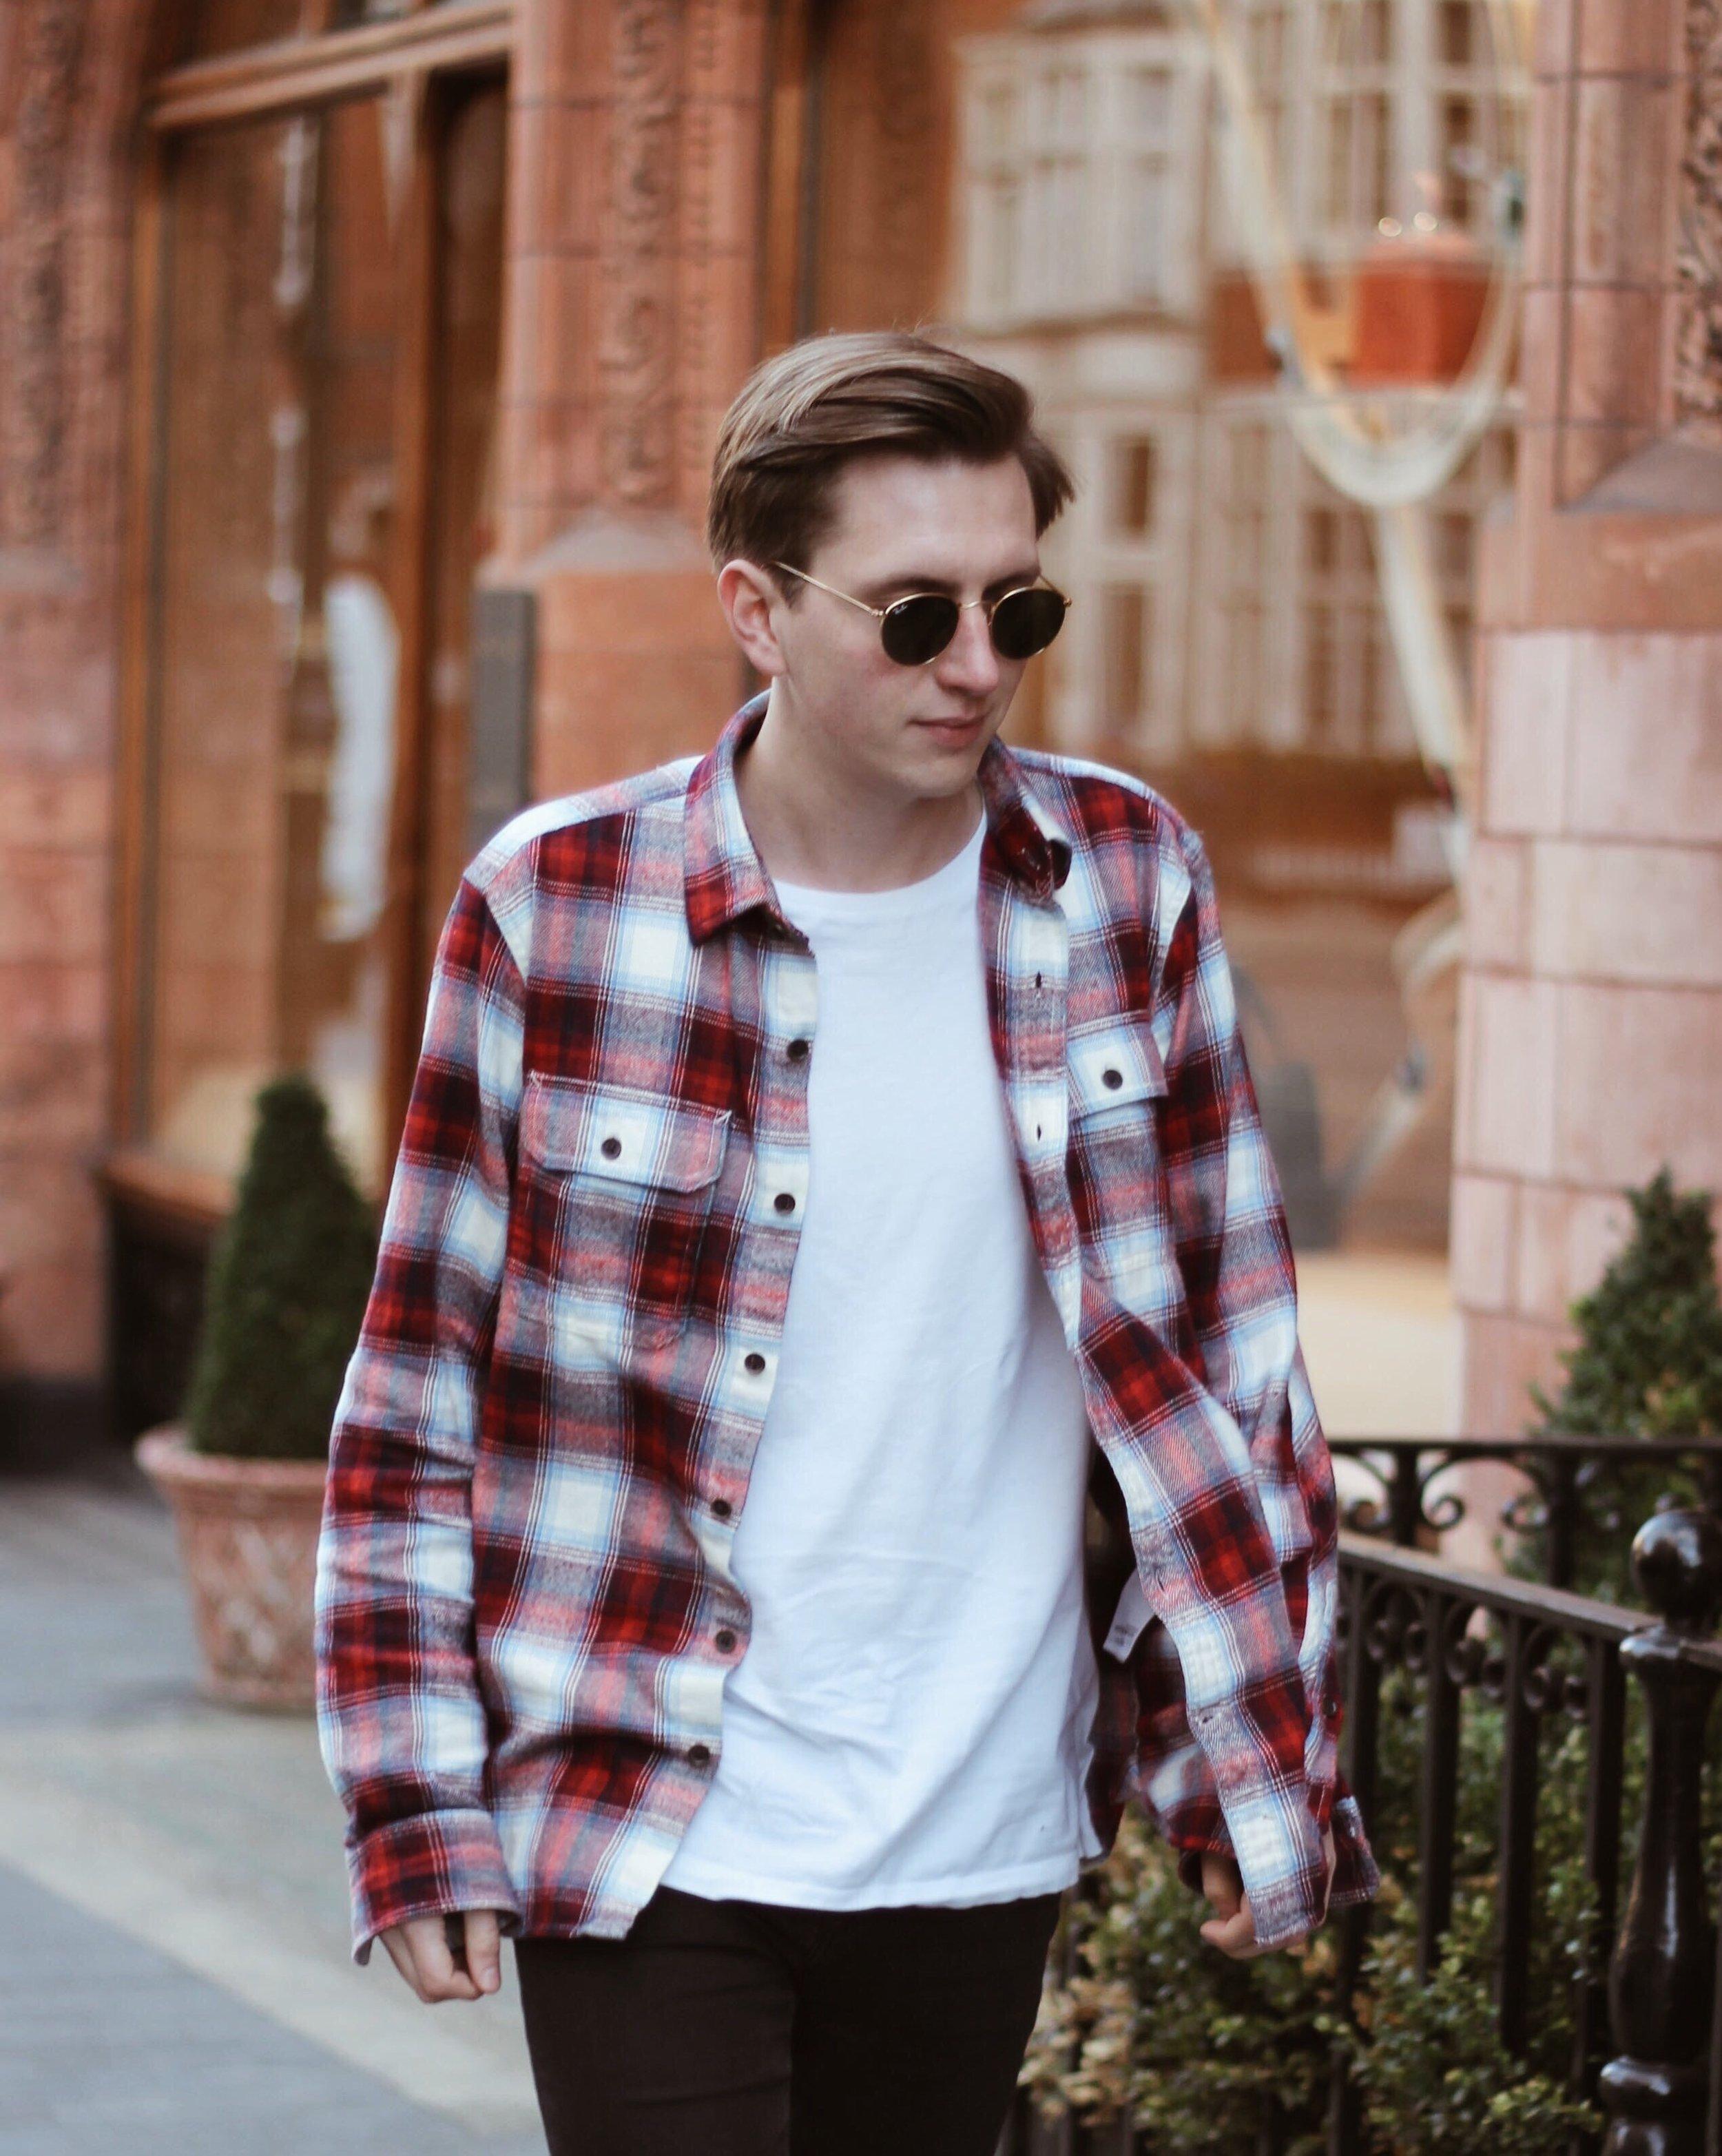 ootd_menswear_london_mayfair_checkered